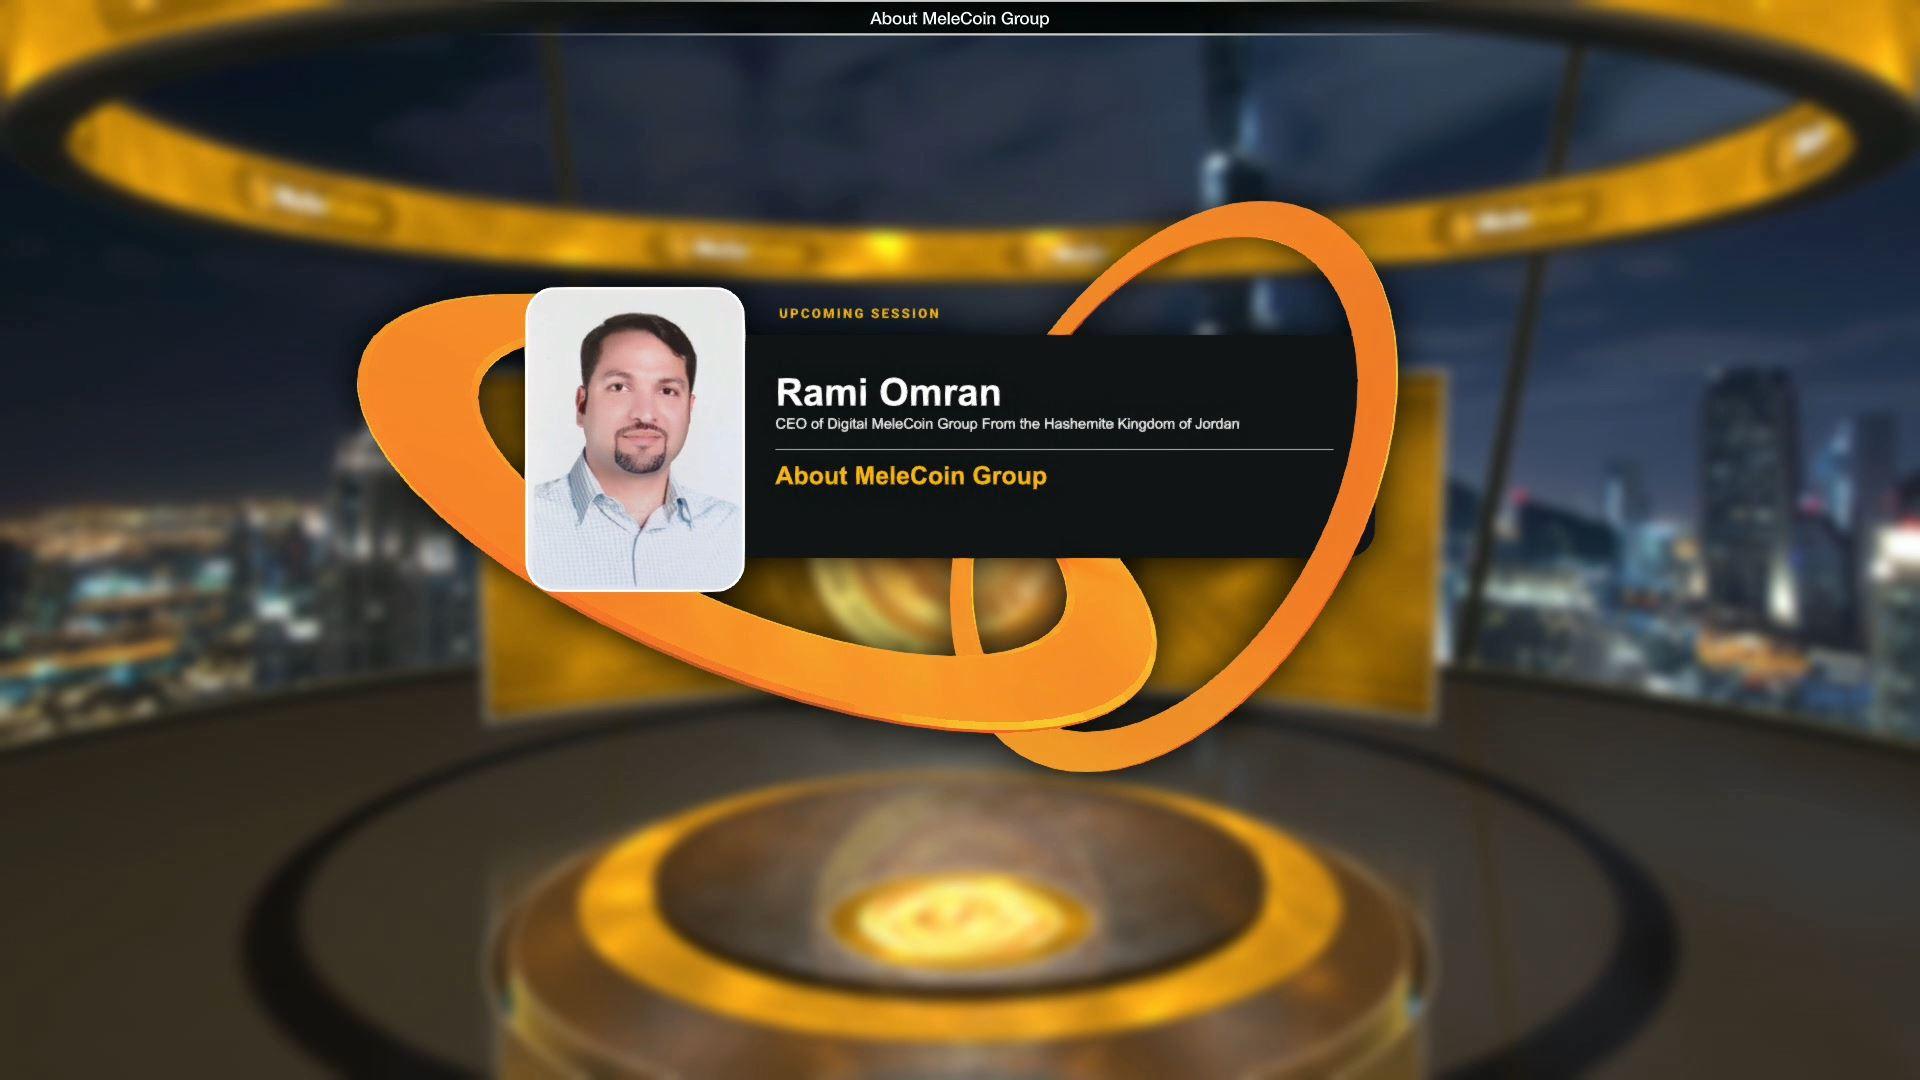 melecoin blockchain technology virtual event speaker profile